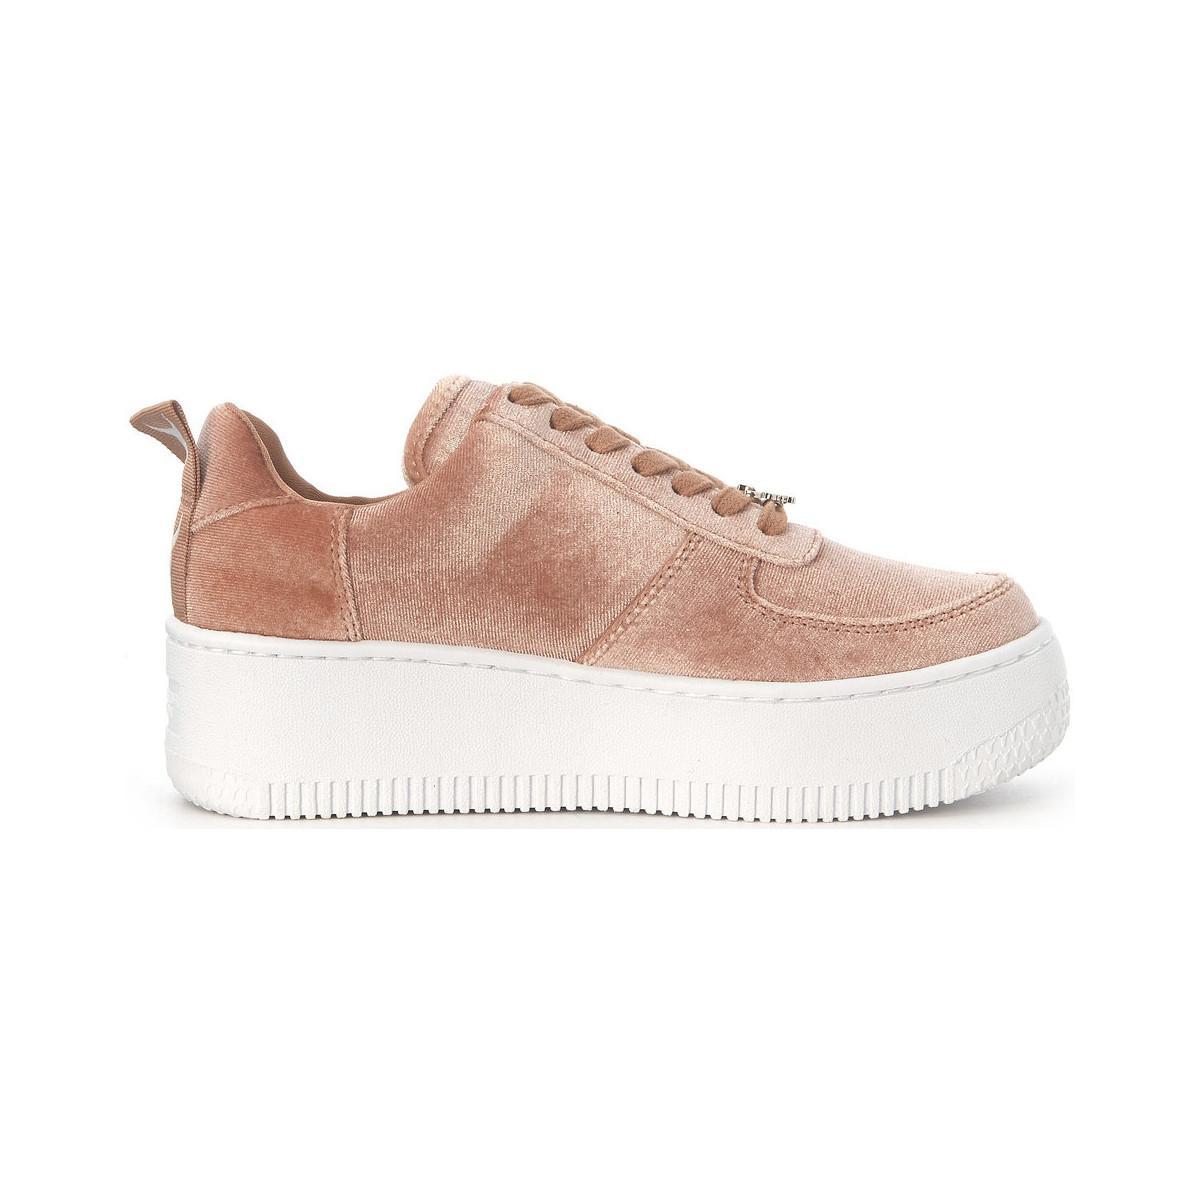 Windsor Smith Racerr Pink Suede Sneaker Men's Shoes (trainers) In Pink for Men